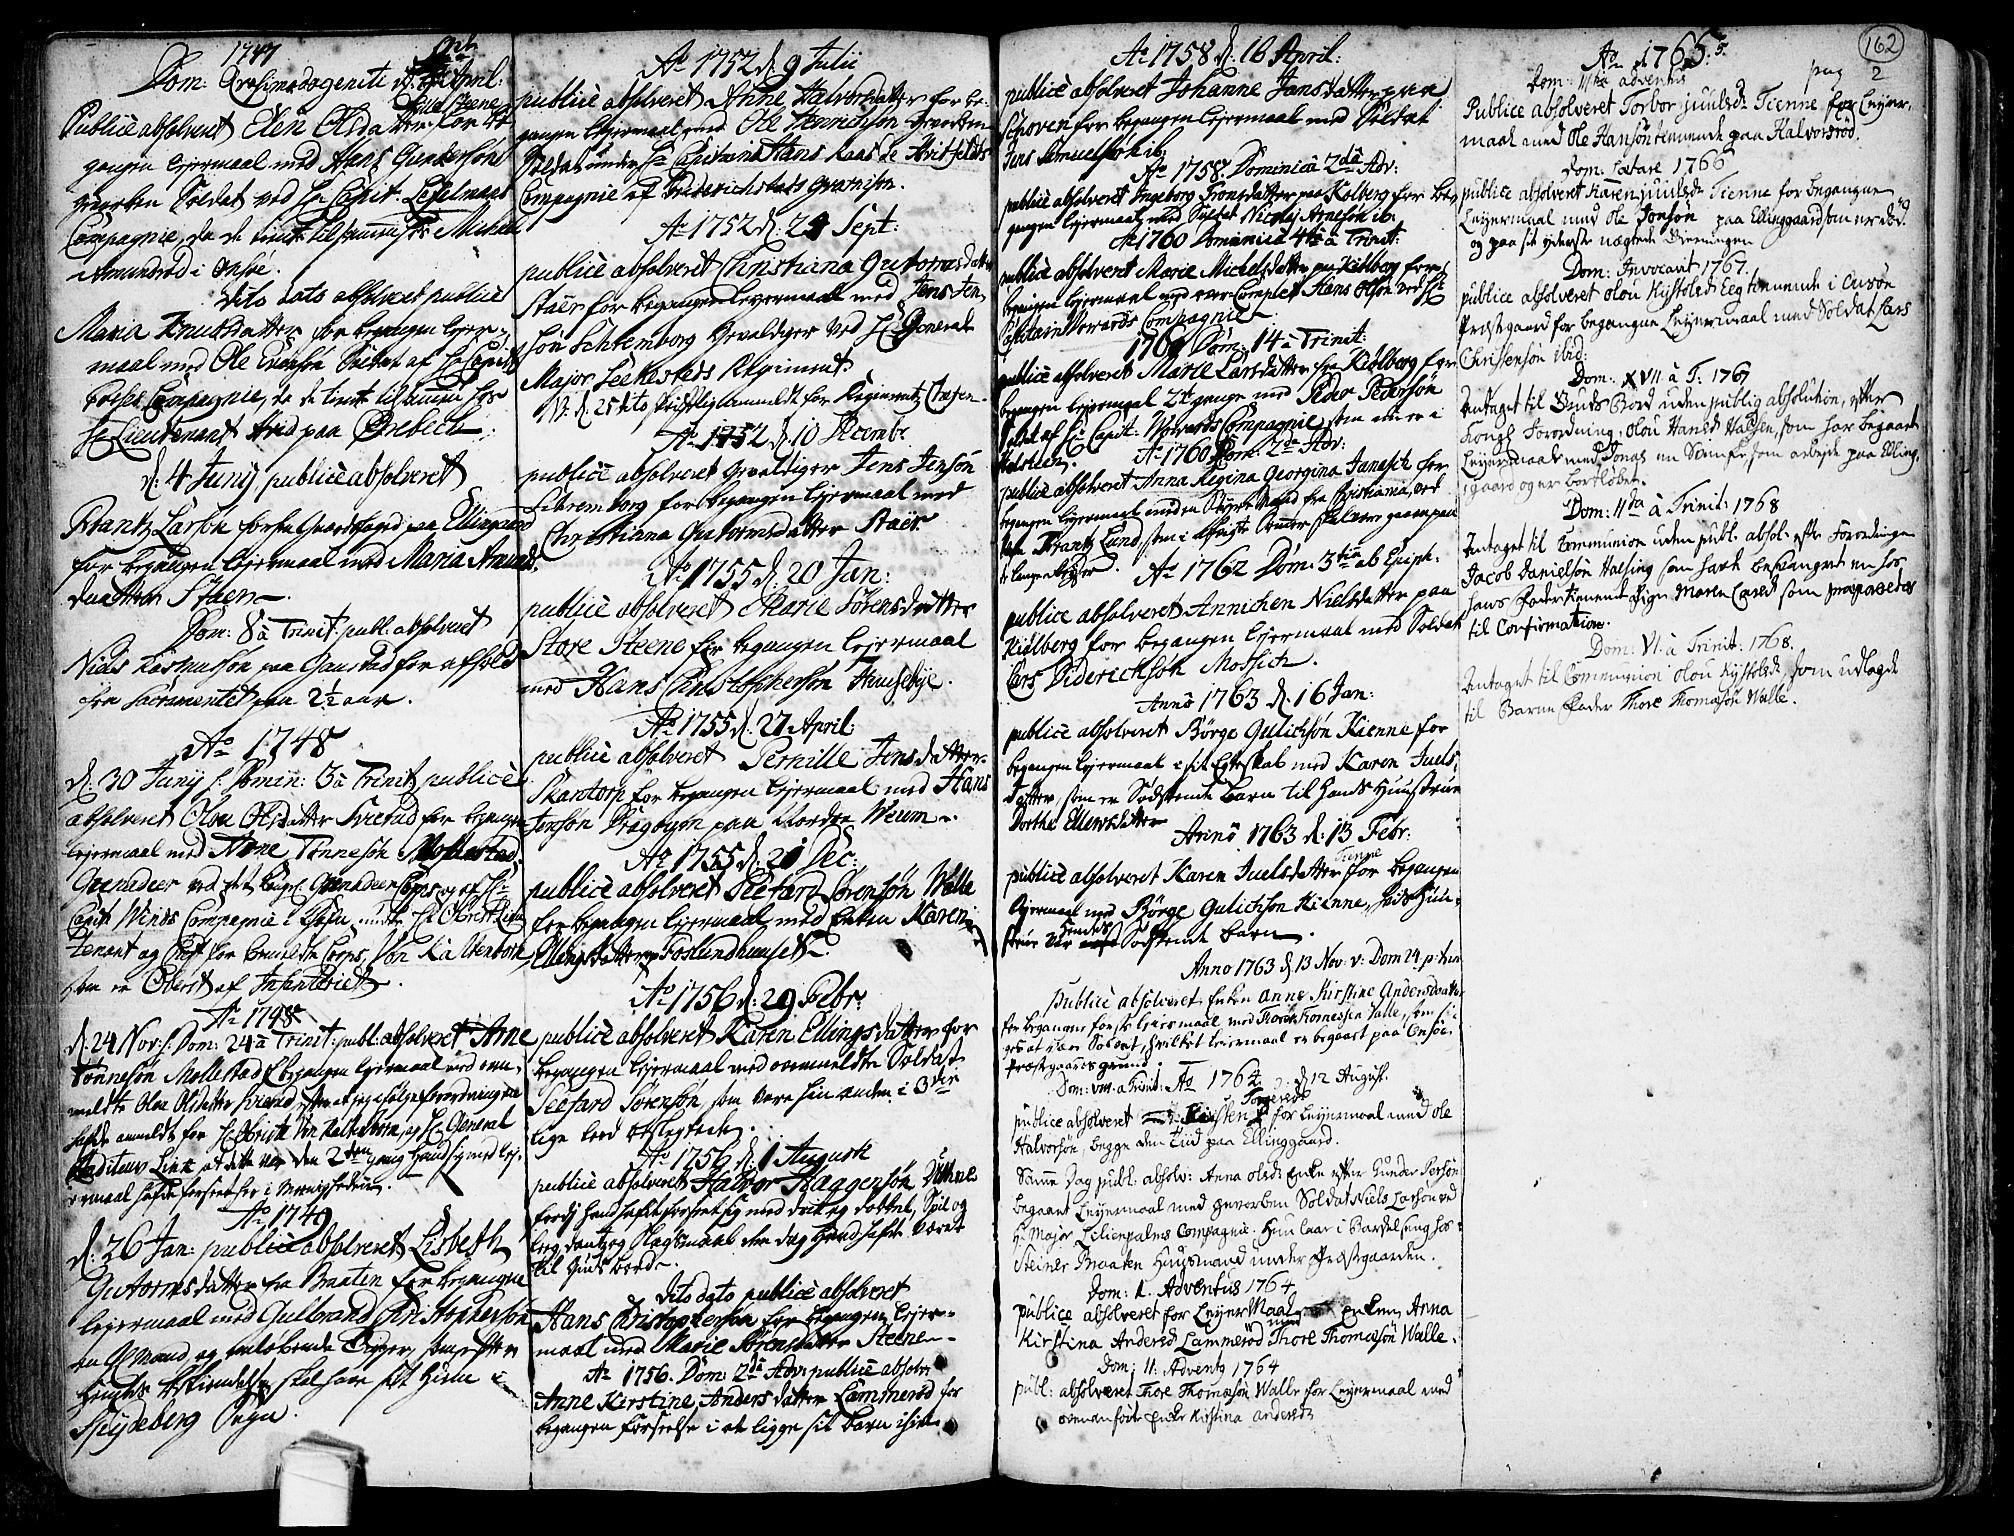 SAO, Onsøy prestekontor Kirkebøker, F/Fa/L0001: Ministerialbok nr. I 1, 1733-1814, s. 162